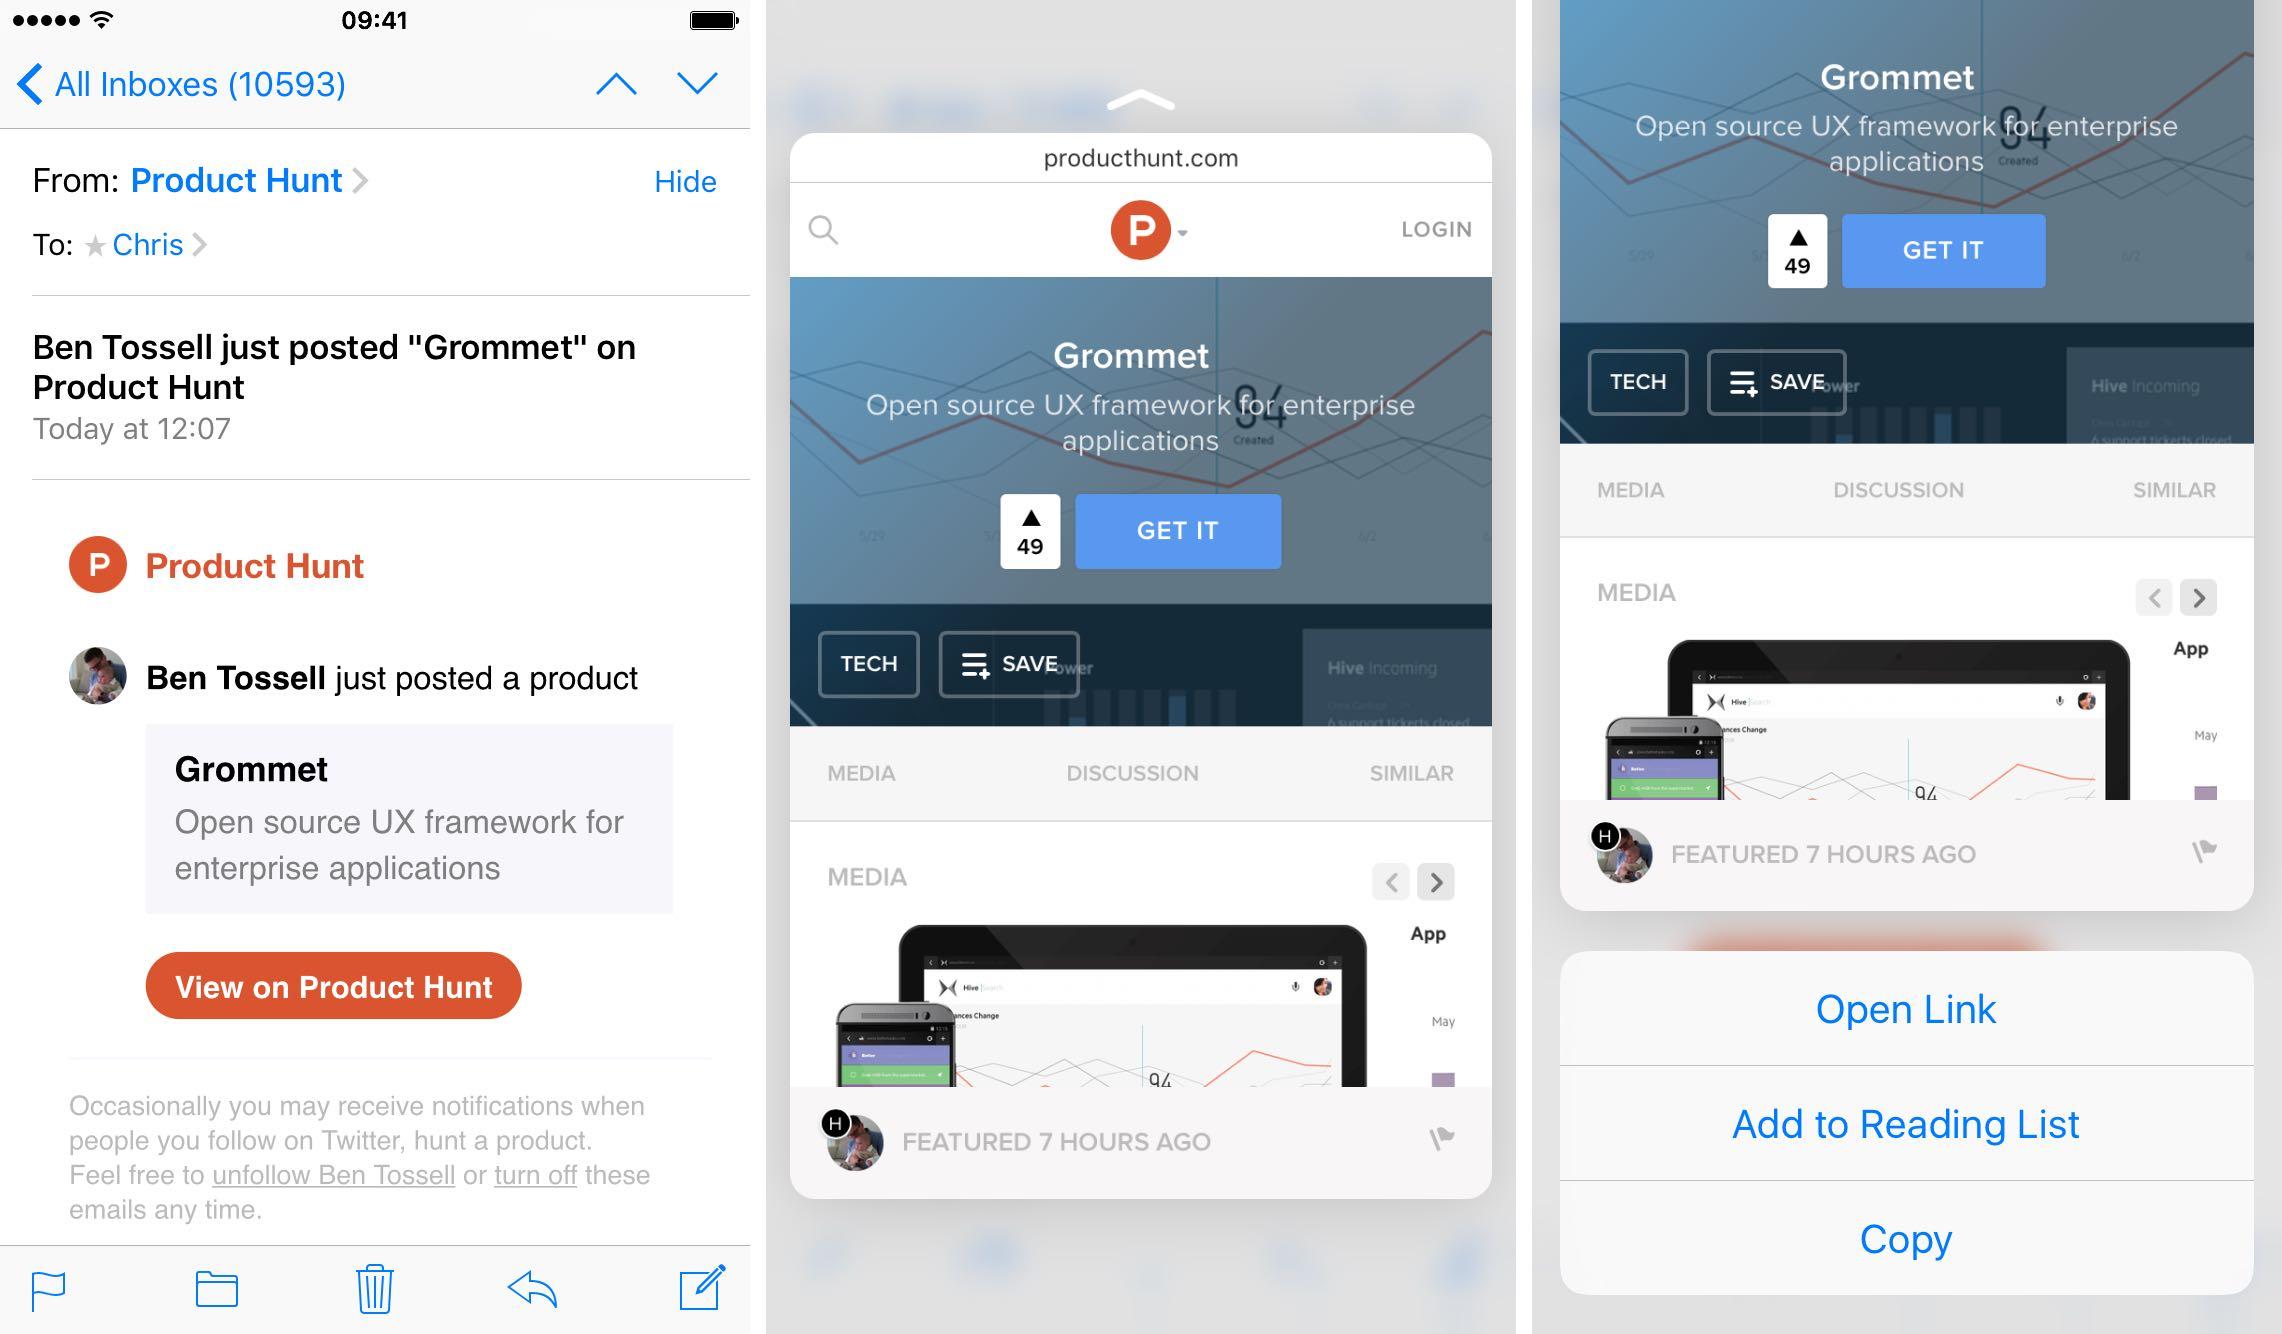 iOS 9 Mail 3D Touch previsualización de enlaces web en correos electrónicos Captura de pantalla del iPhone 6s 003